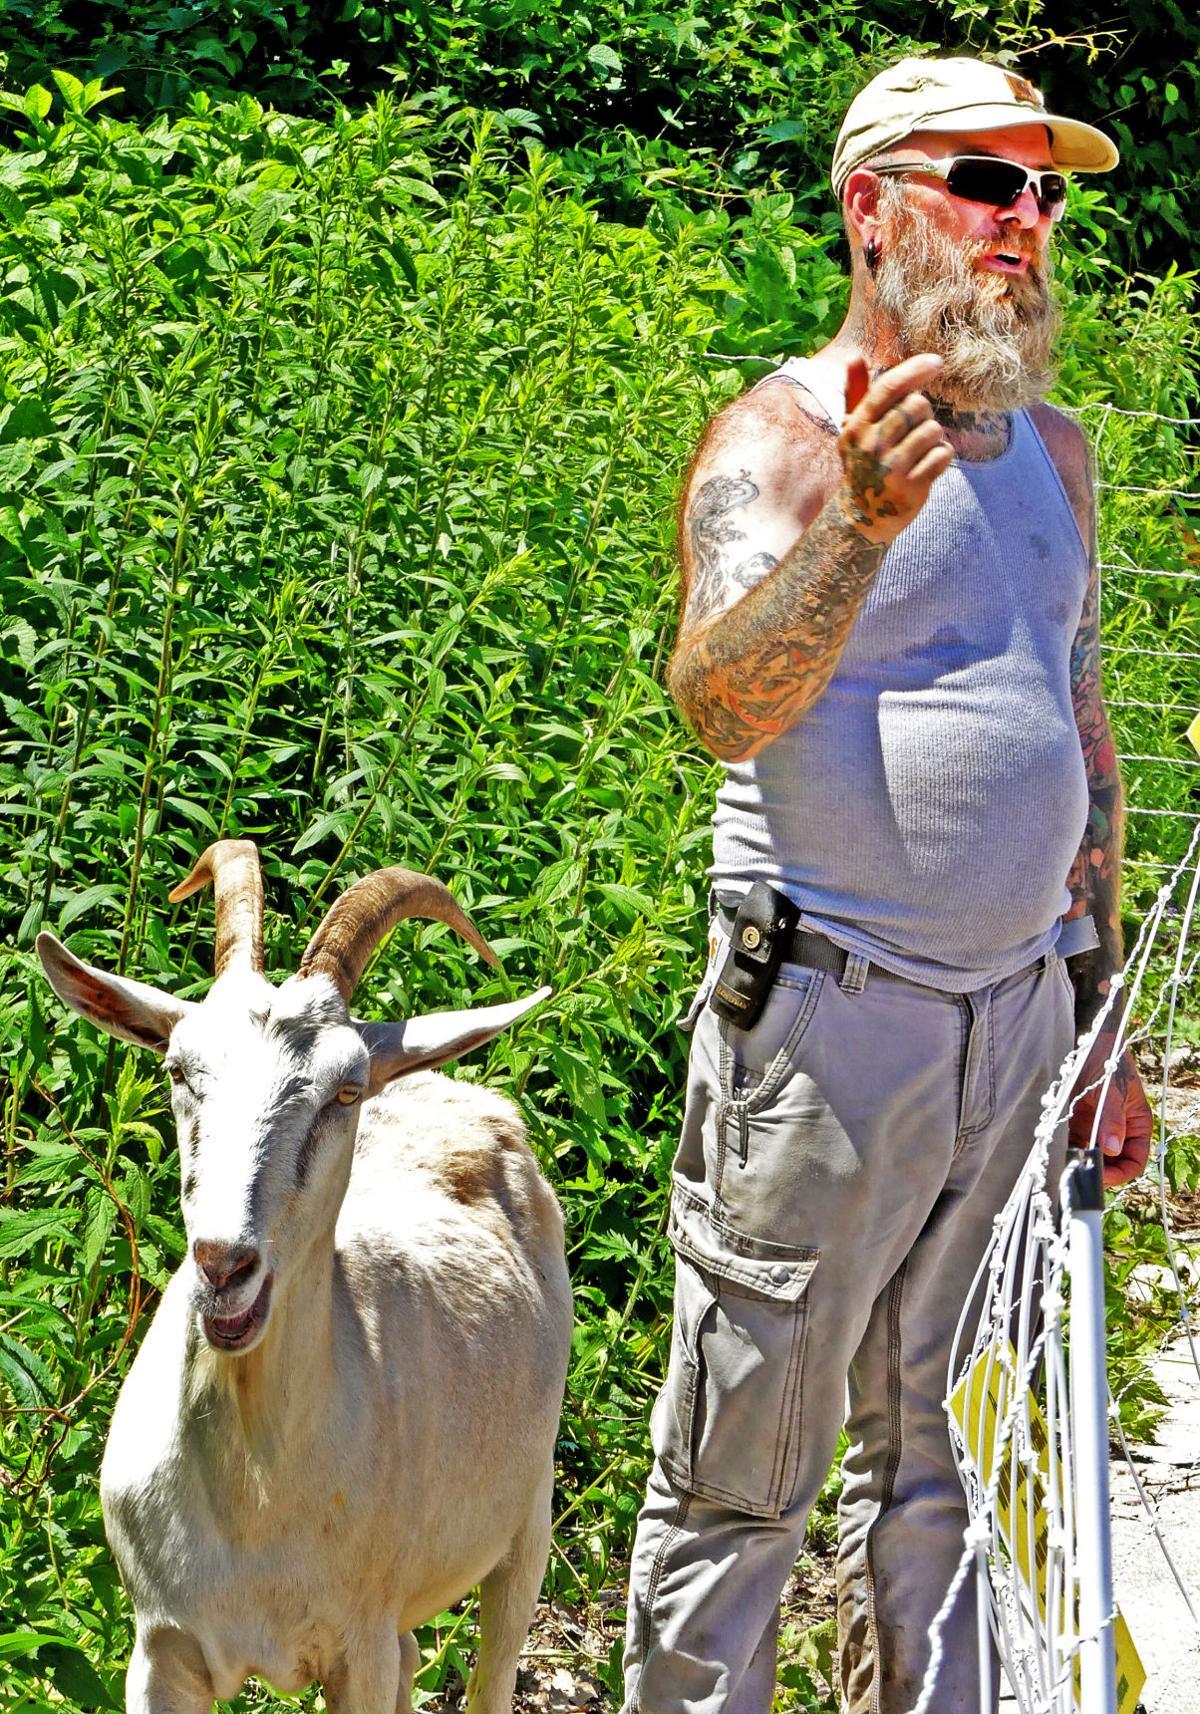 062619 WES Goat scaping Avondale 116.JPG